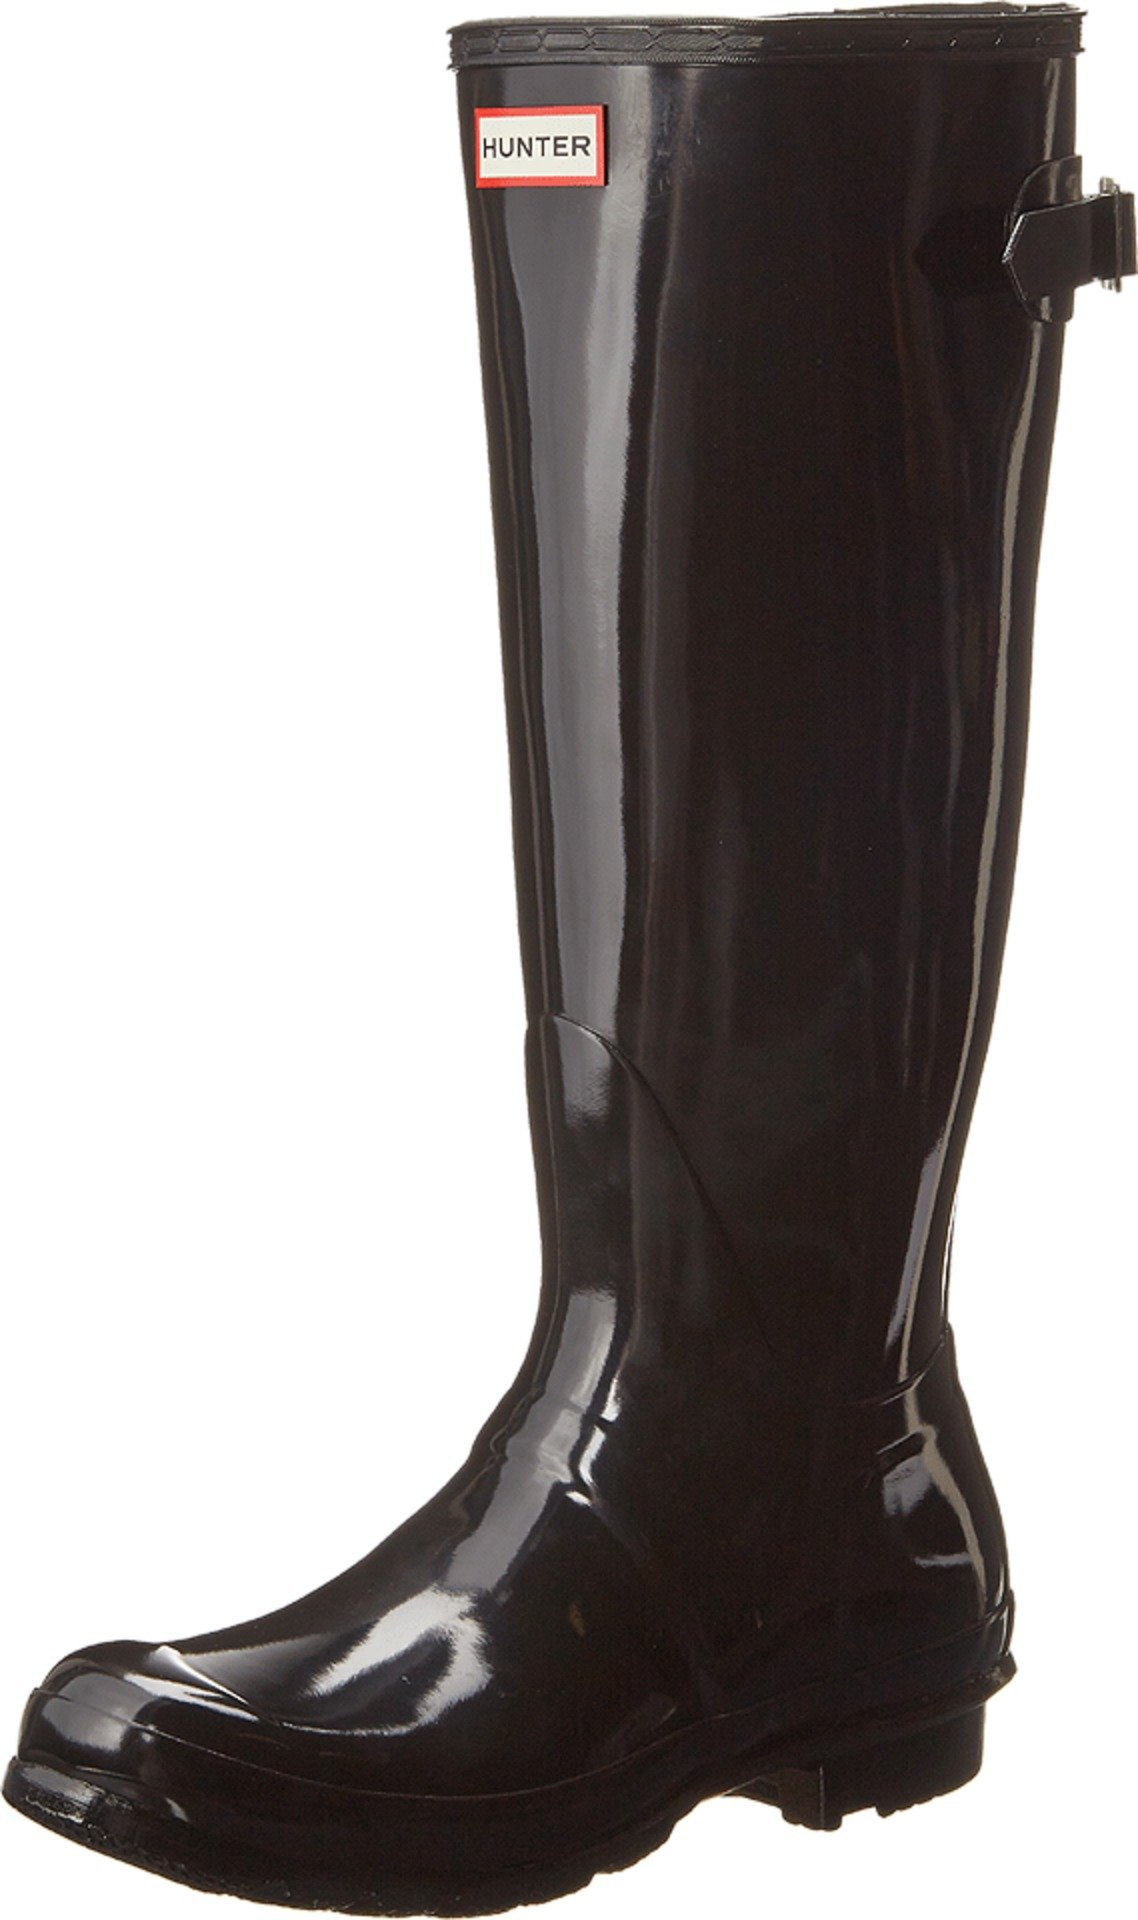 Hunter Boots Women's Original Back Adjustable Gloss Tall Rain Boot Black 11 M US